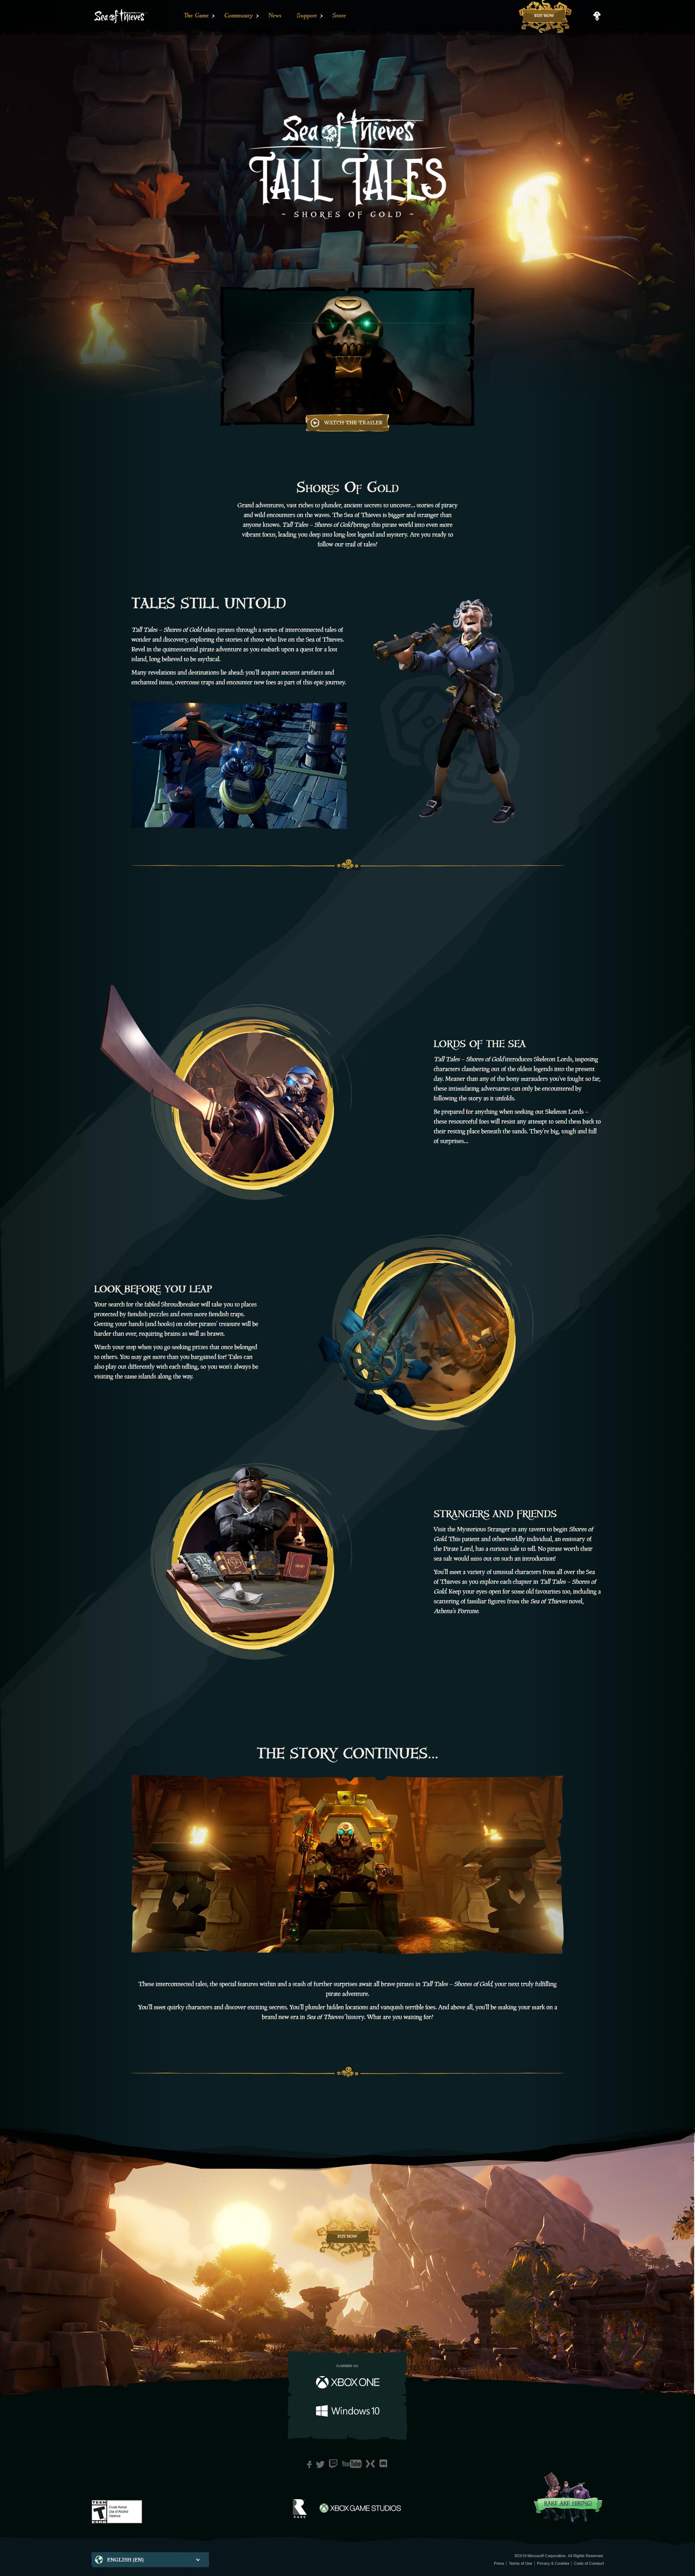 ArtStation - Sea of Thieves Anniversary - 3D Marketing Renders